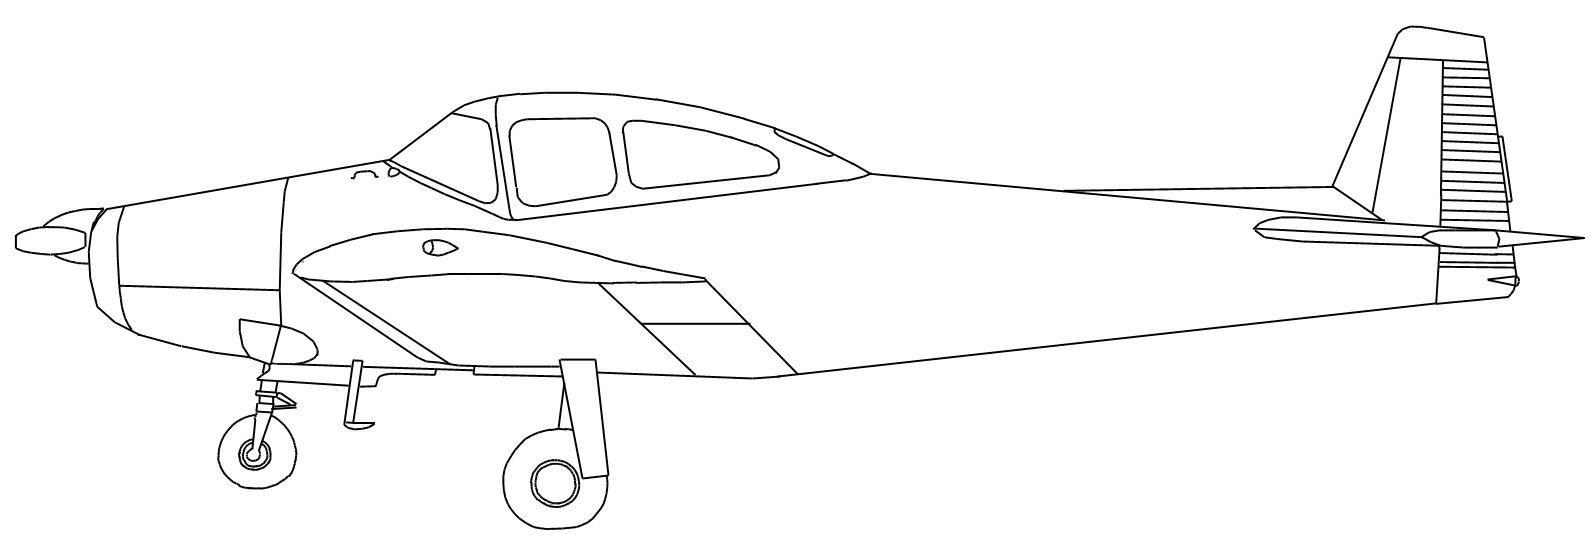 2002 Acura Tsx Radio Wiring Diagram 2002 Hyundai Santa Fe